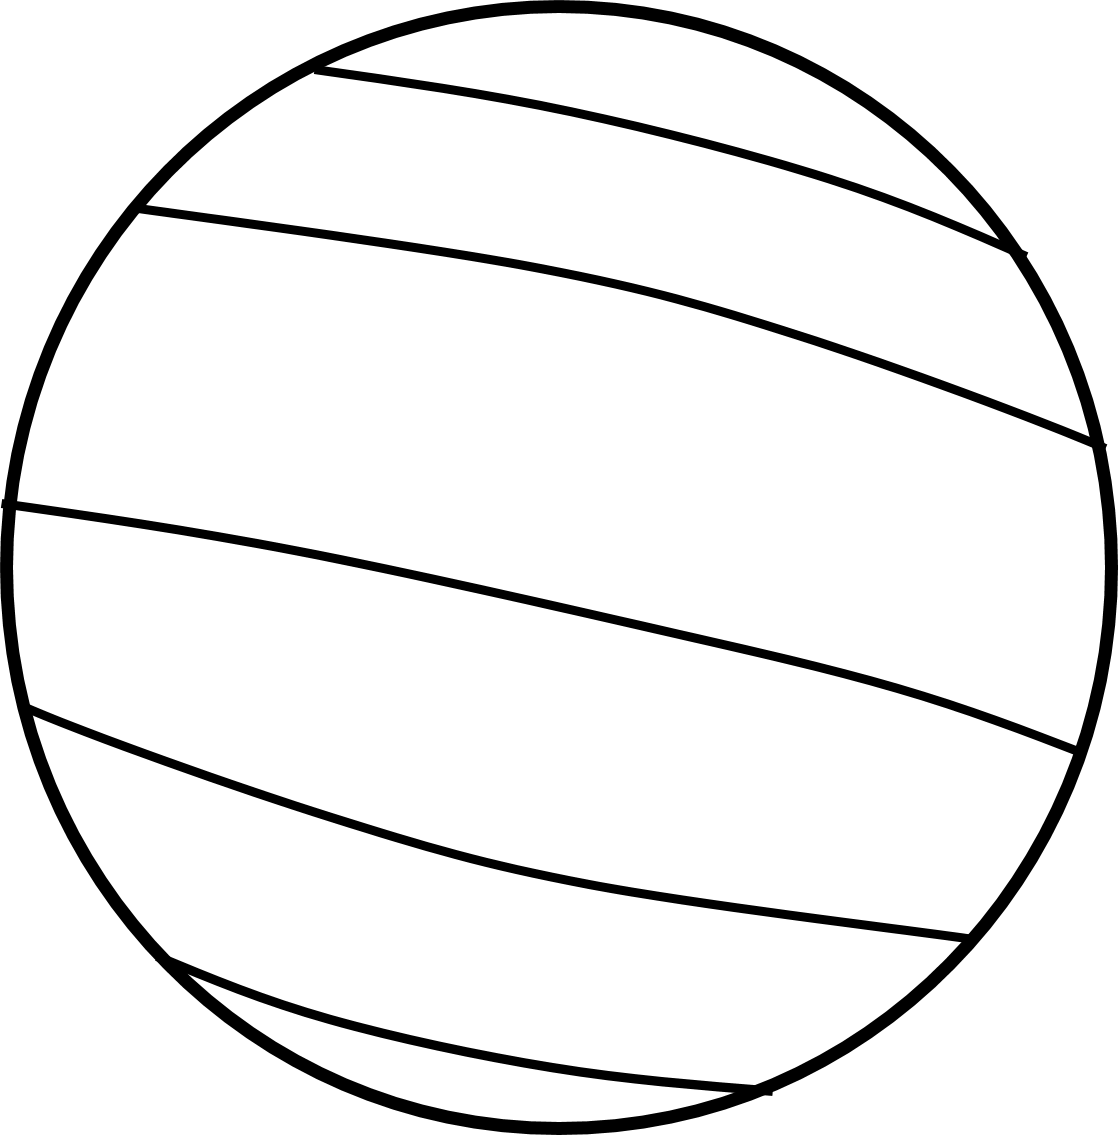 1118x1135 Planets Clipart Black